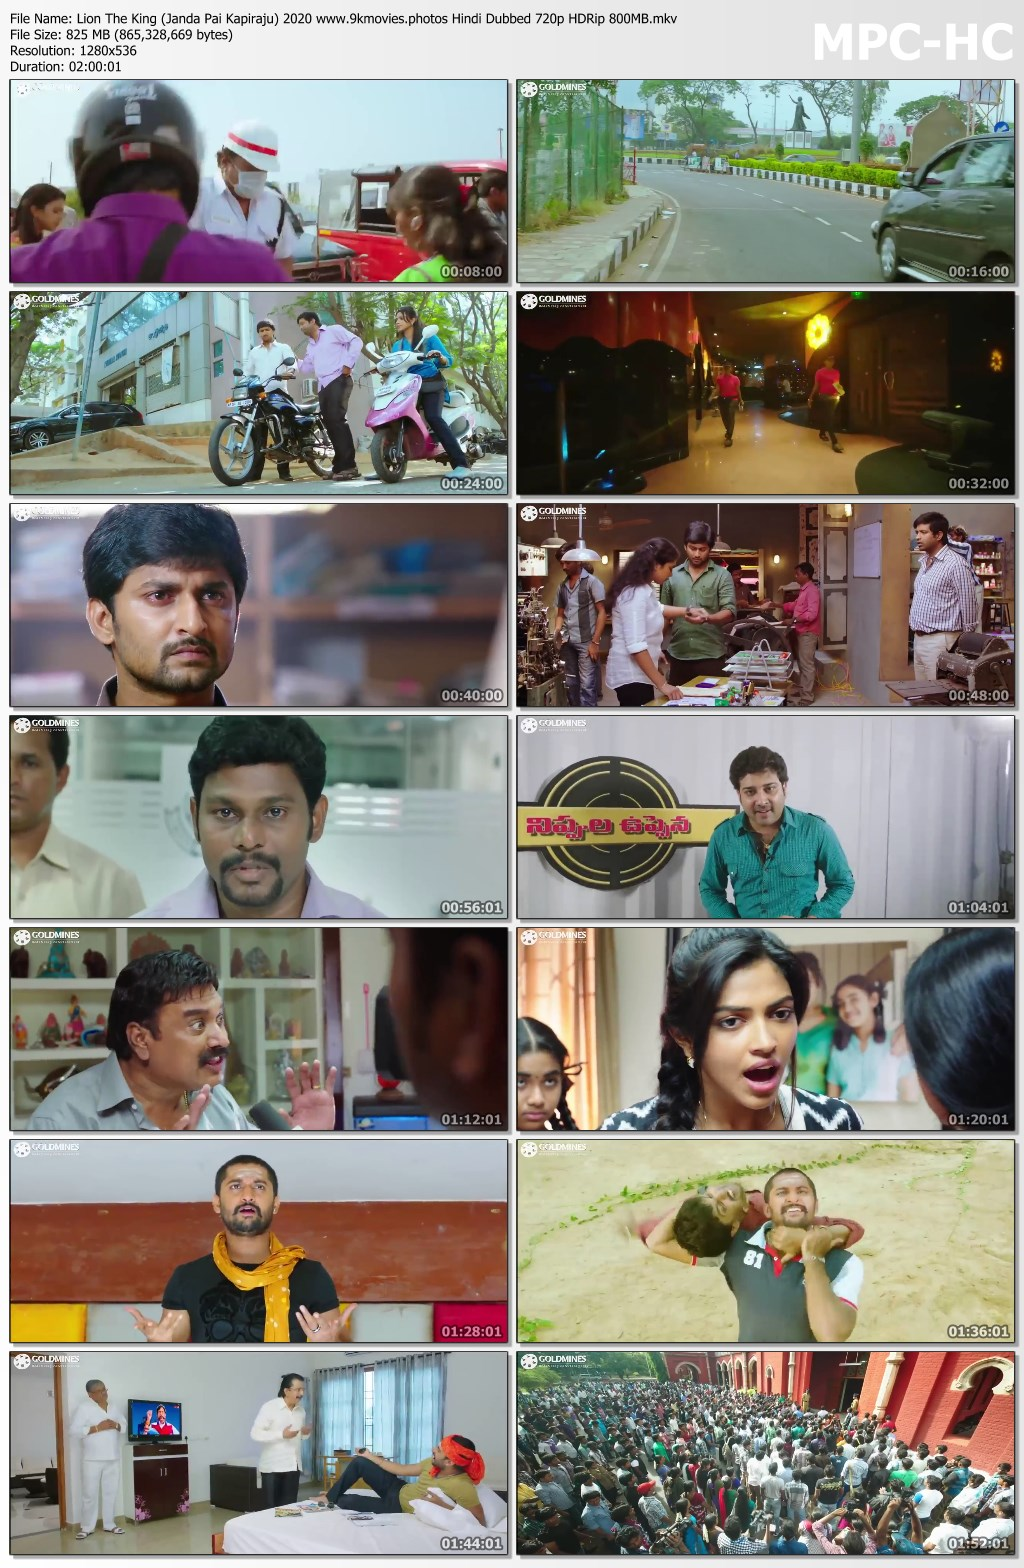 Lion The King Janda Pai Kapiraju 2020 Hindi Dubbed 720p Hdrip 800mb Mkv Kutty Ml Movie